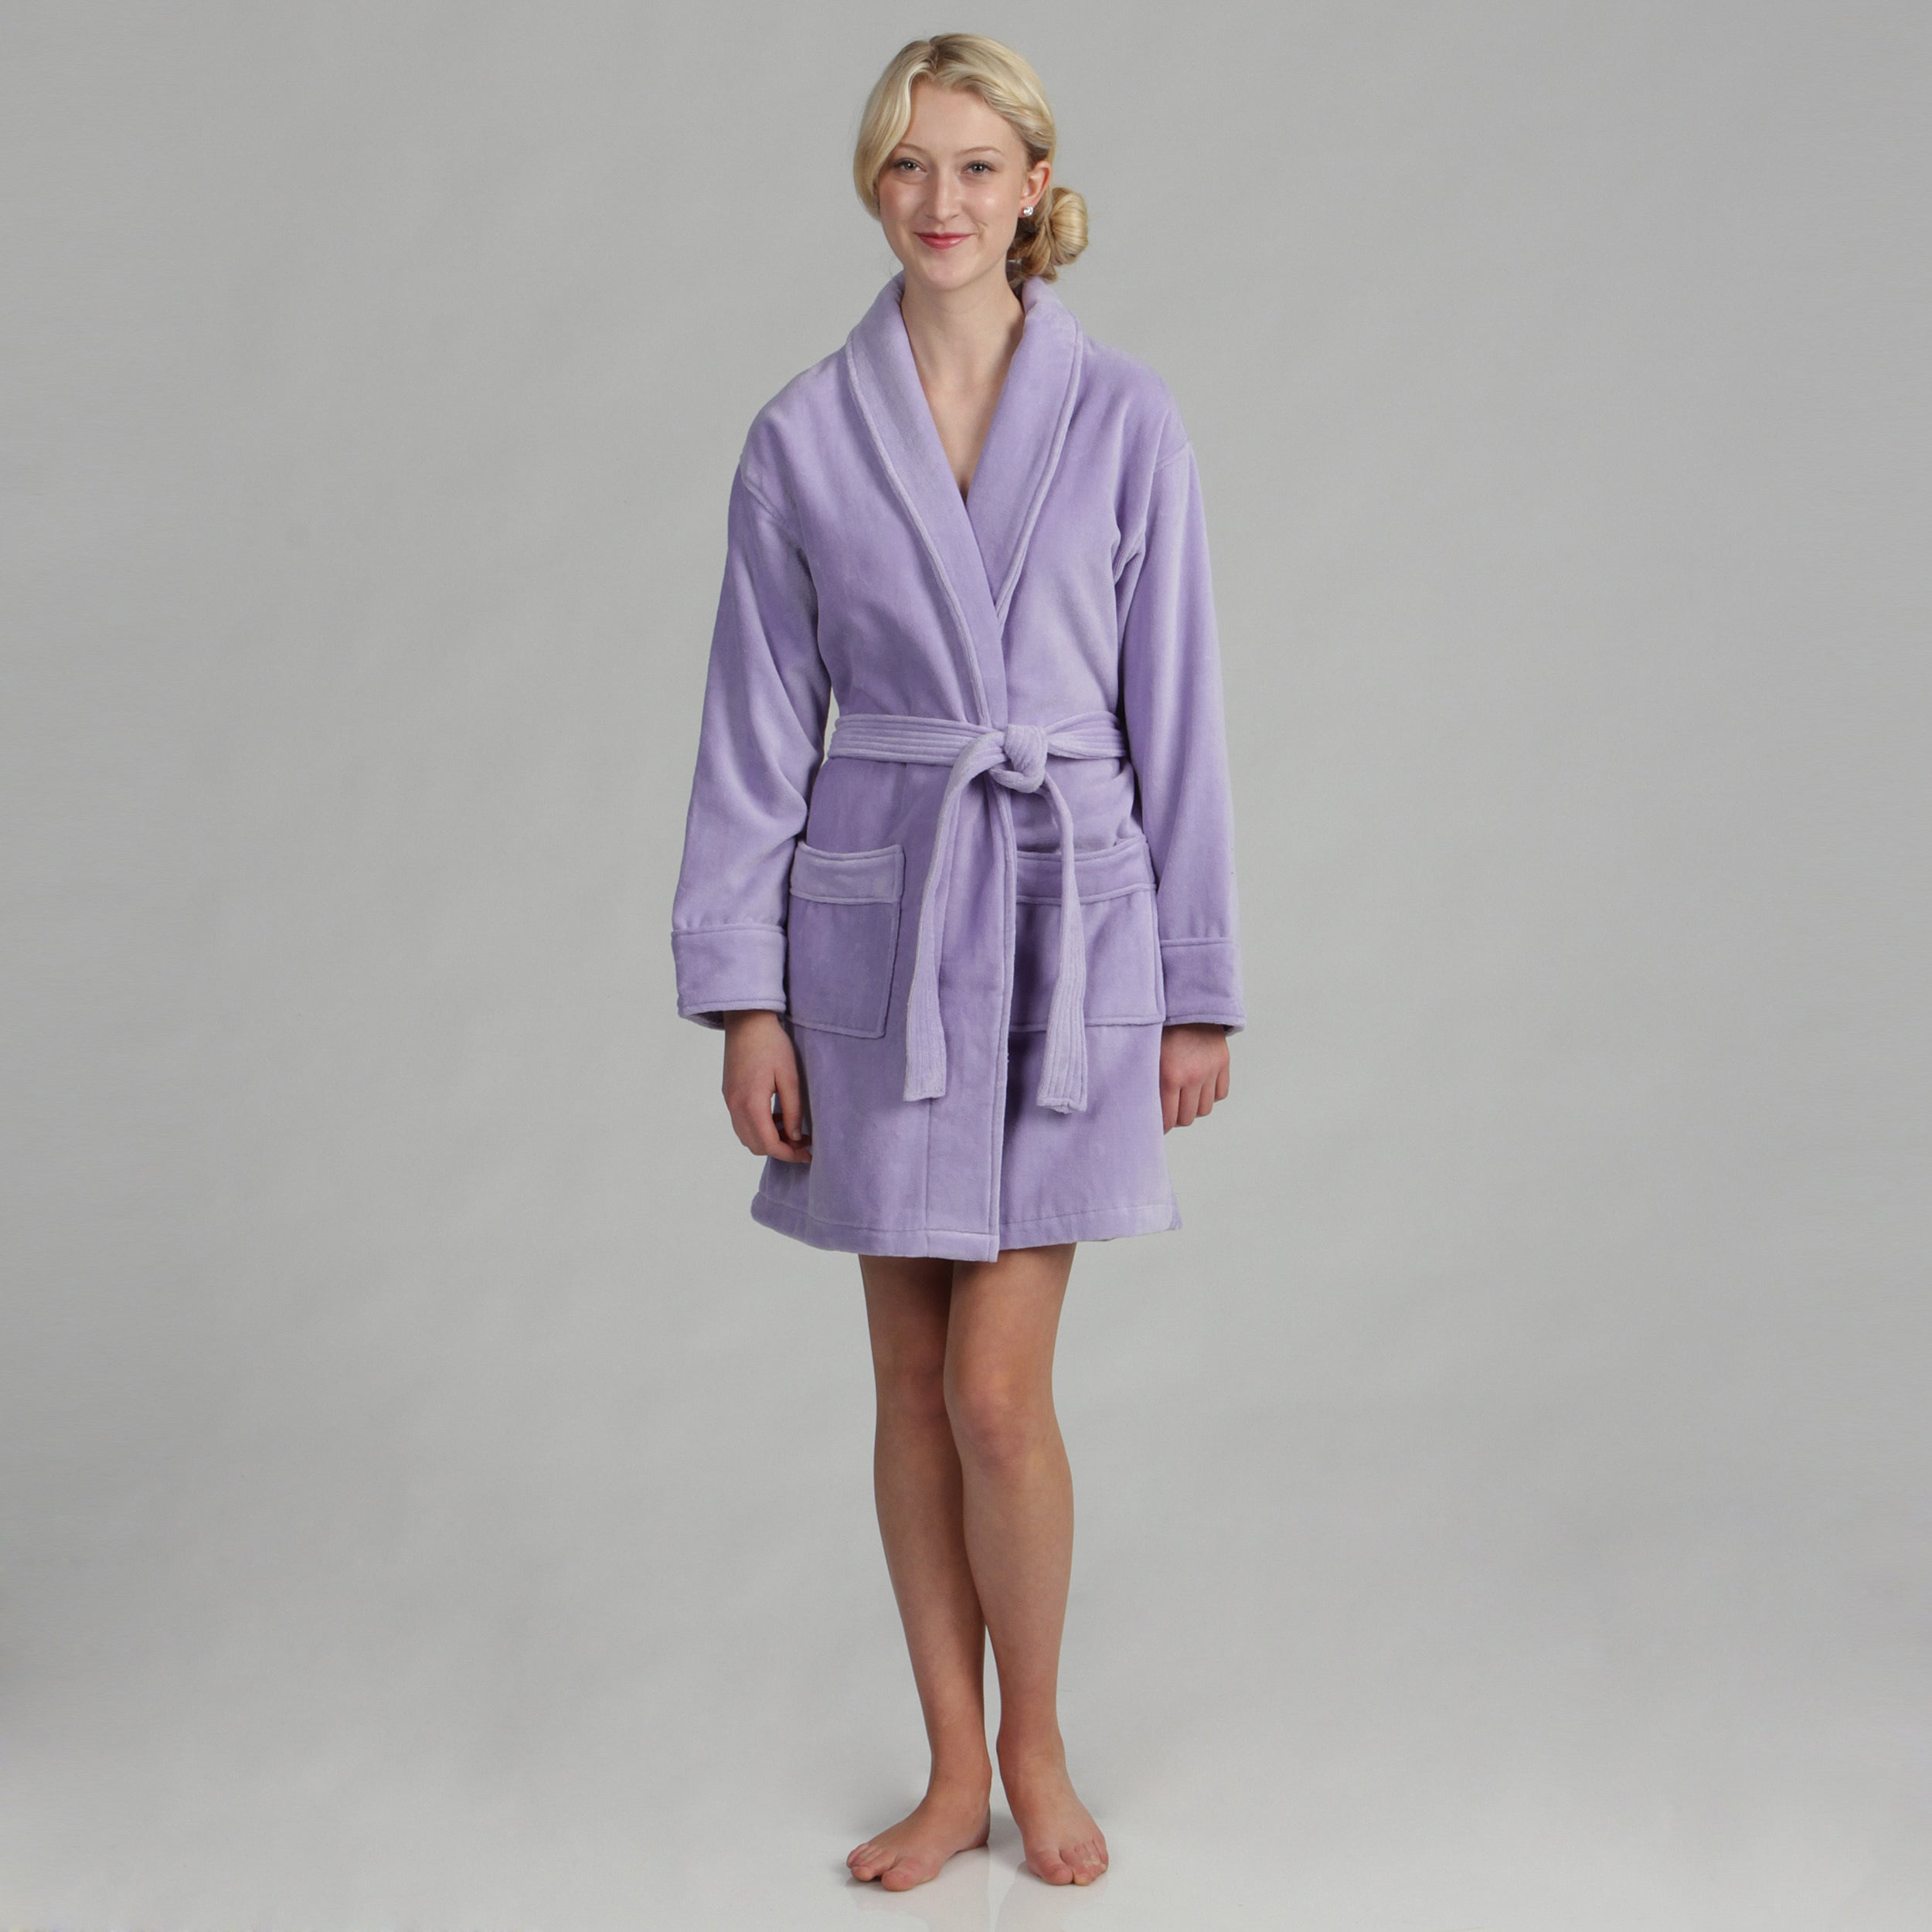 Fantastic Women's Cotton Terrycloth Bath Robe - Free Shipping Today  FC26